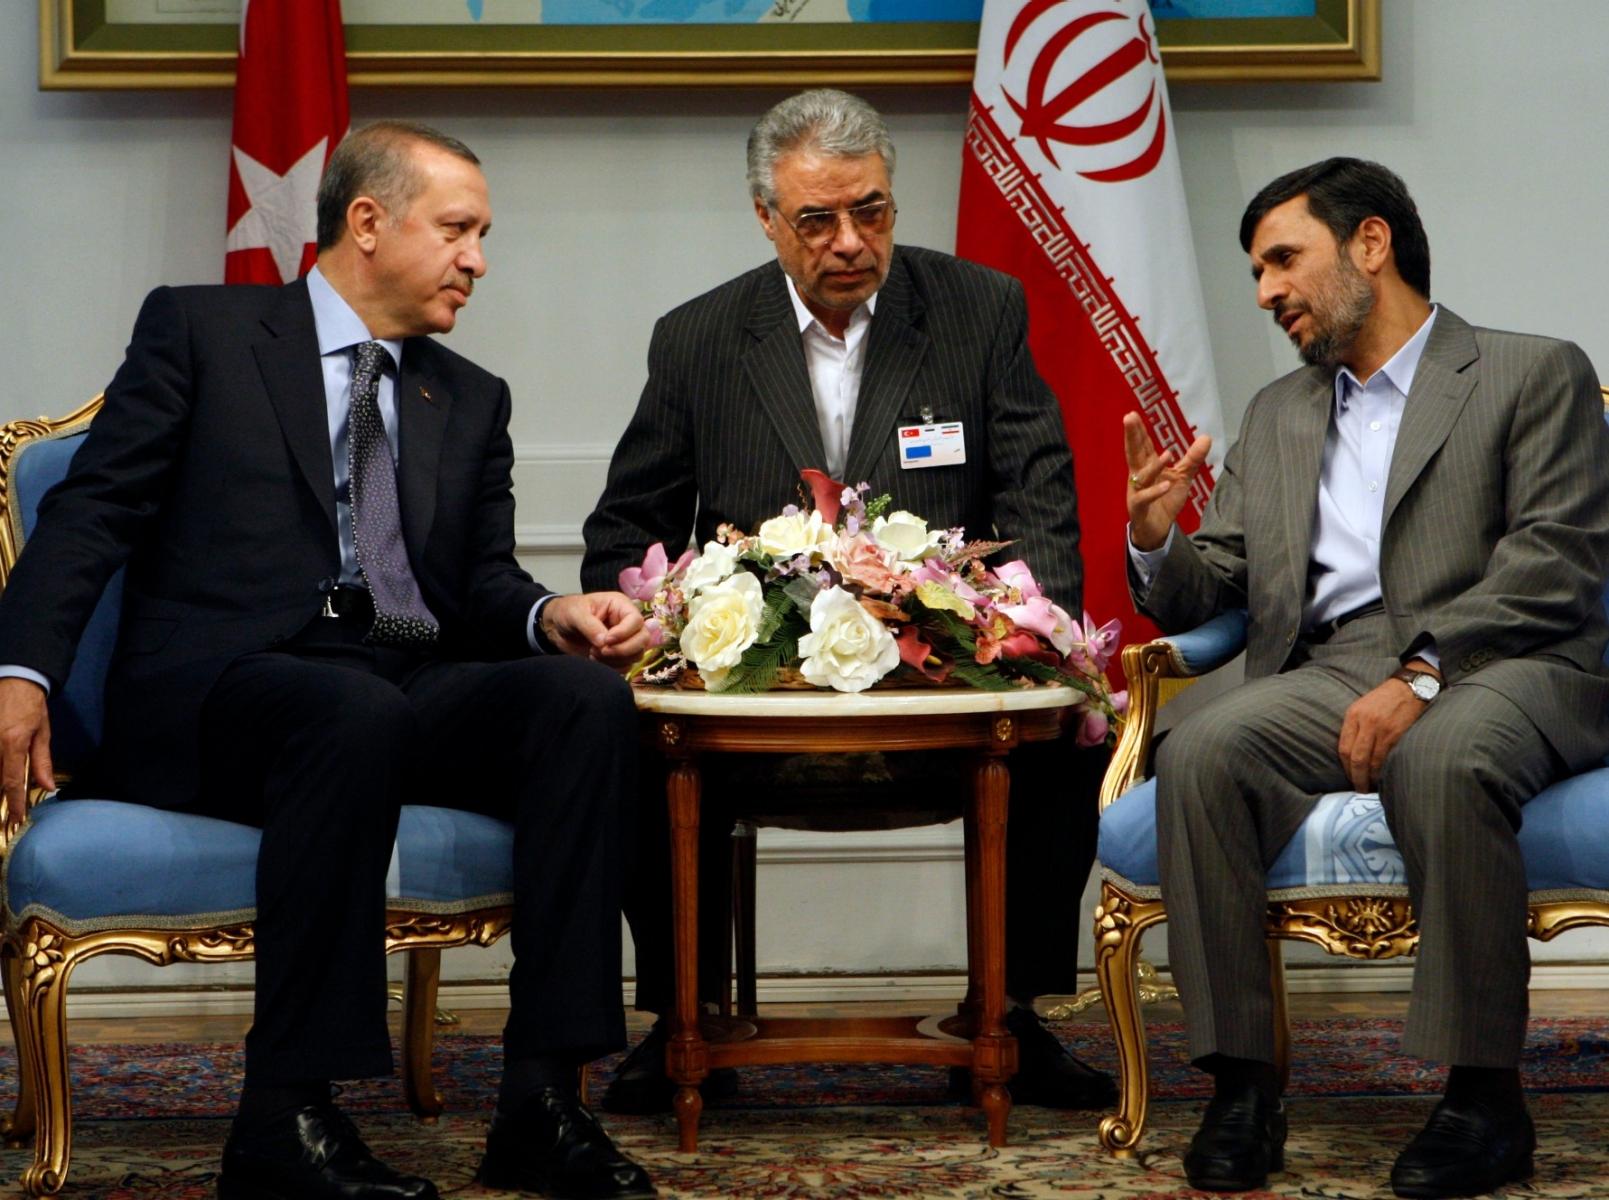 Turkey-Iran Relations after the JDP